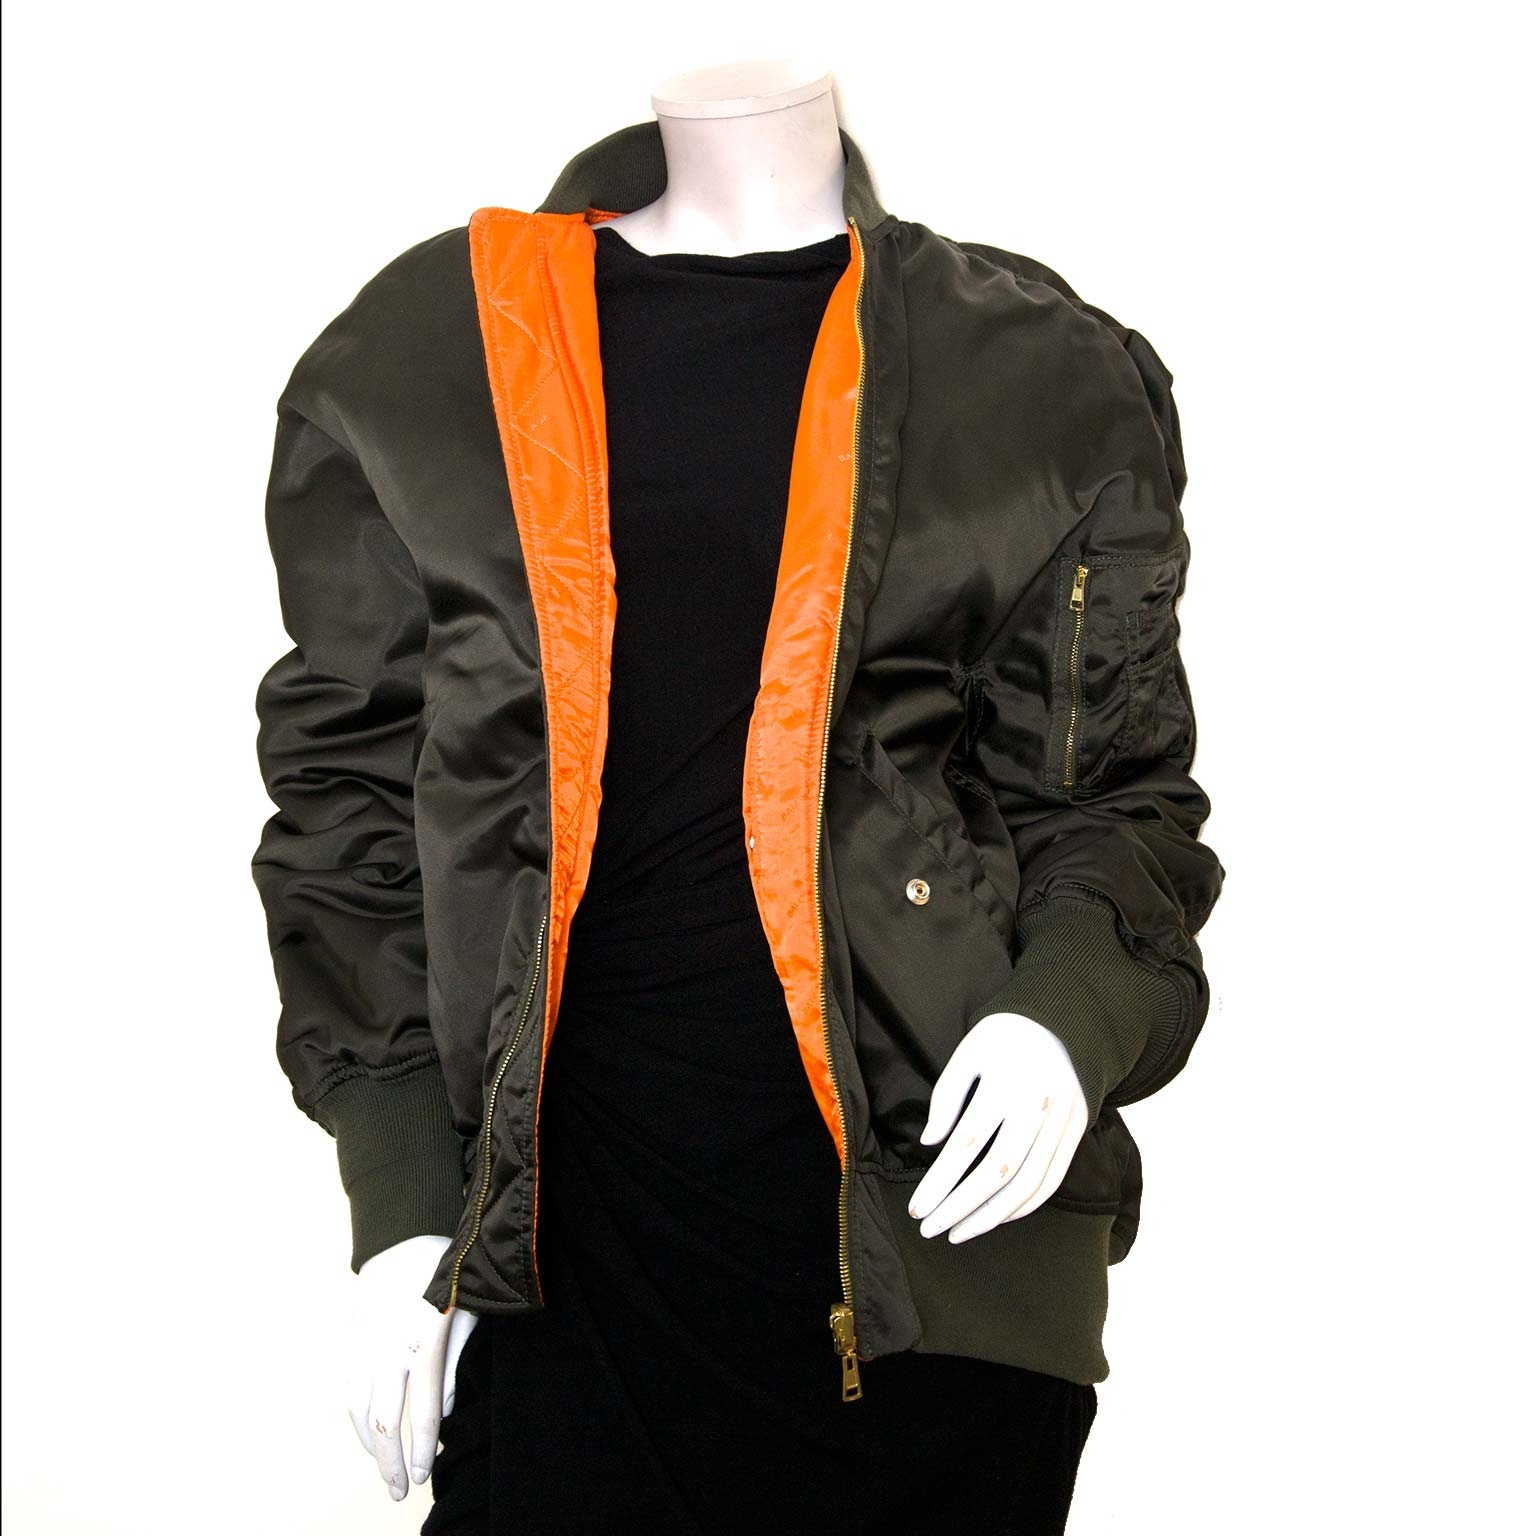 Koop authentieke Balenciaga bomber jacket en kleding online bij Labellov vintage webshop